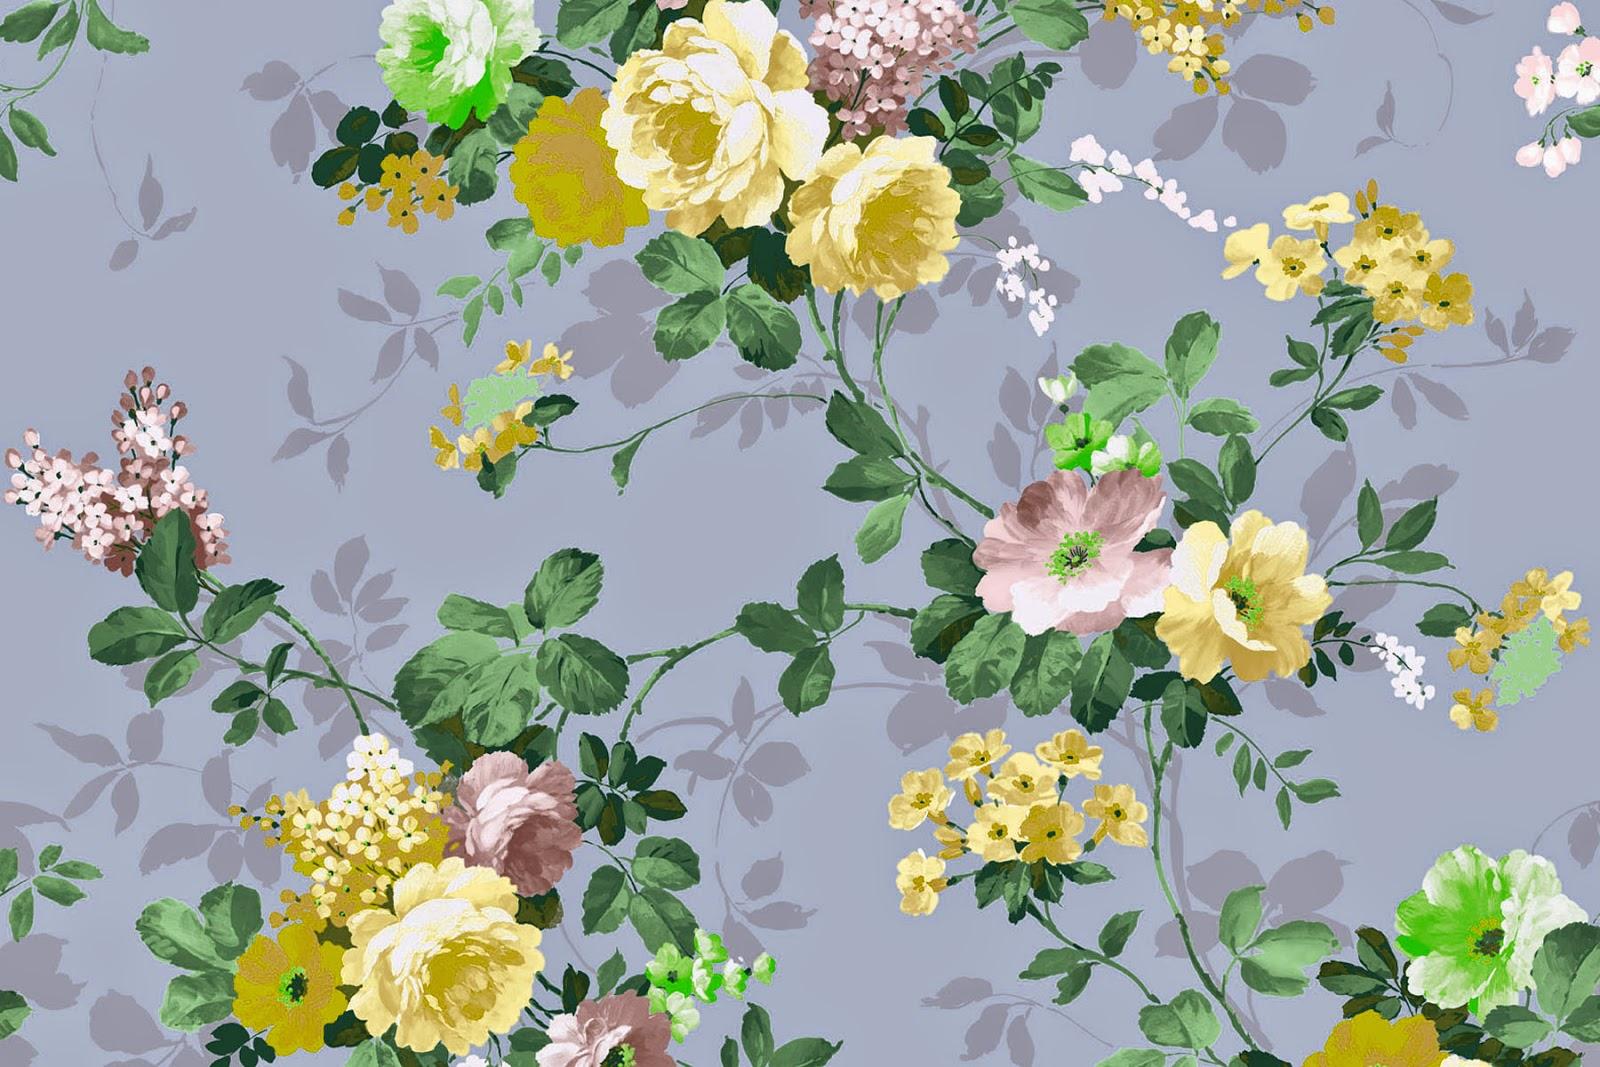 Doodlecraft: Vintage Floral Wallpaper Freebies!